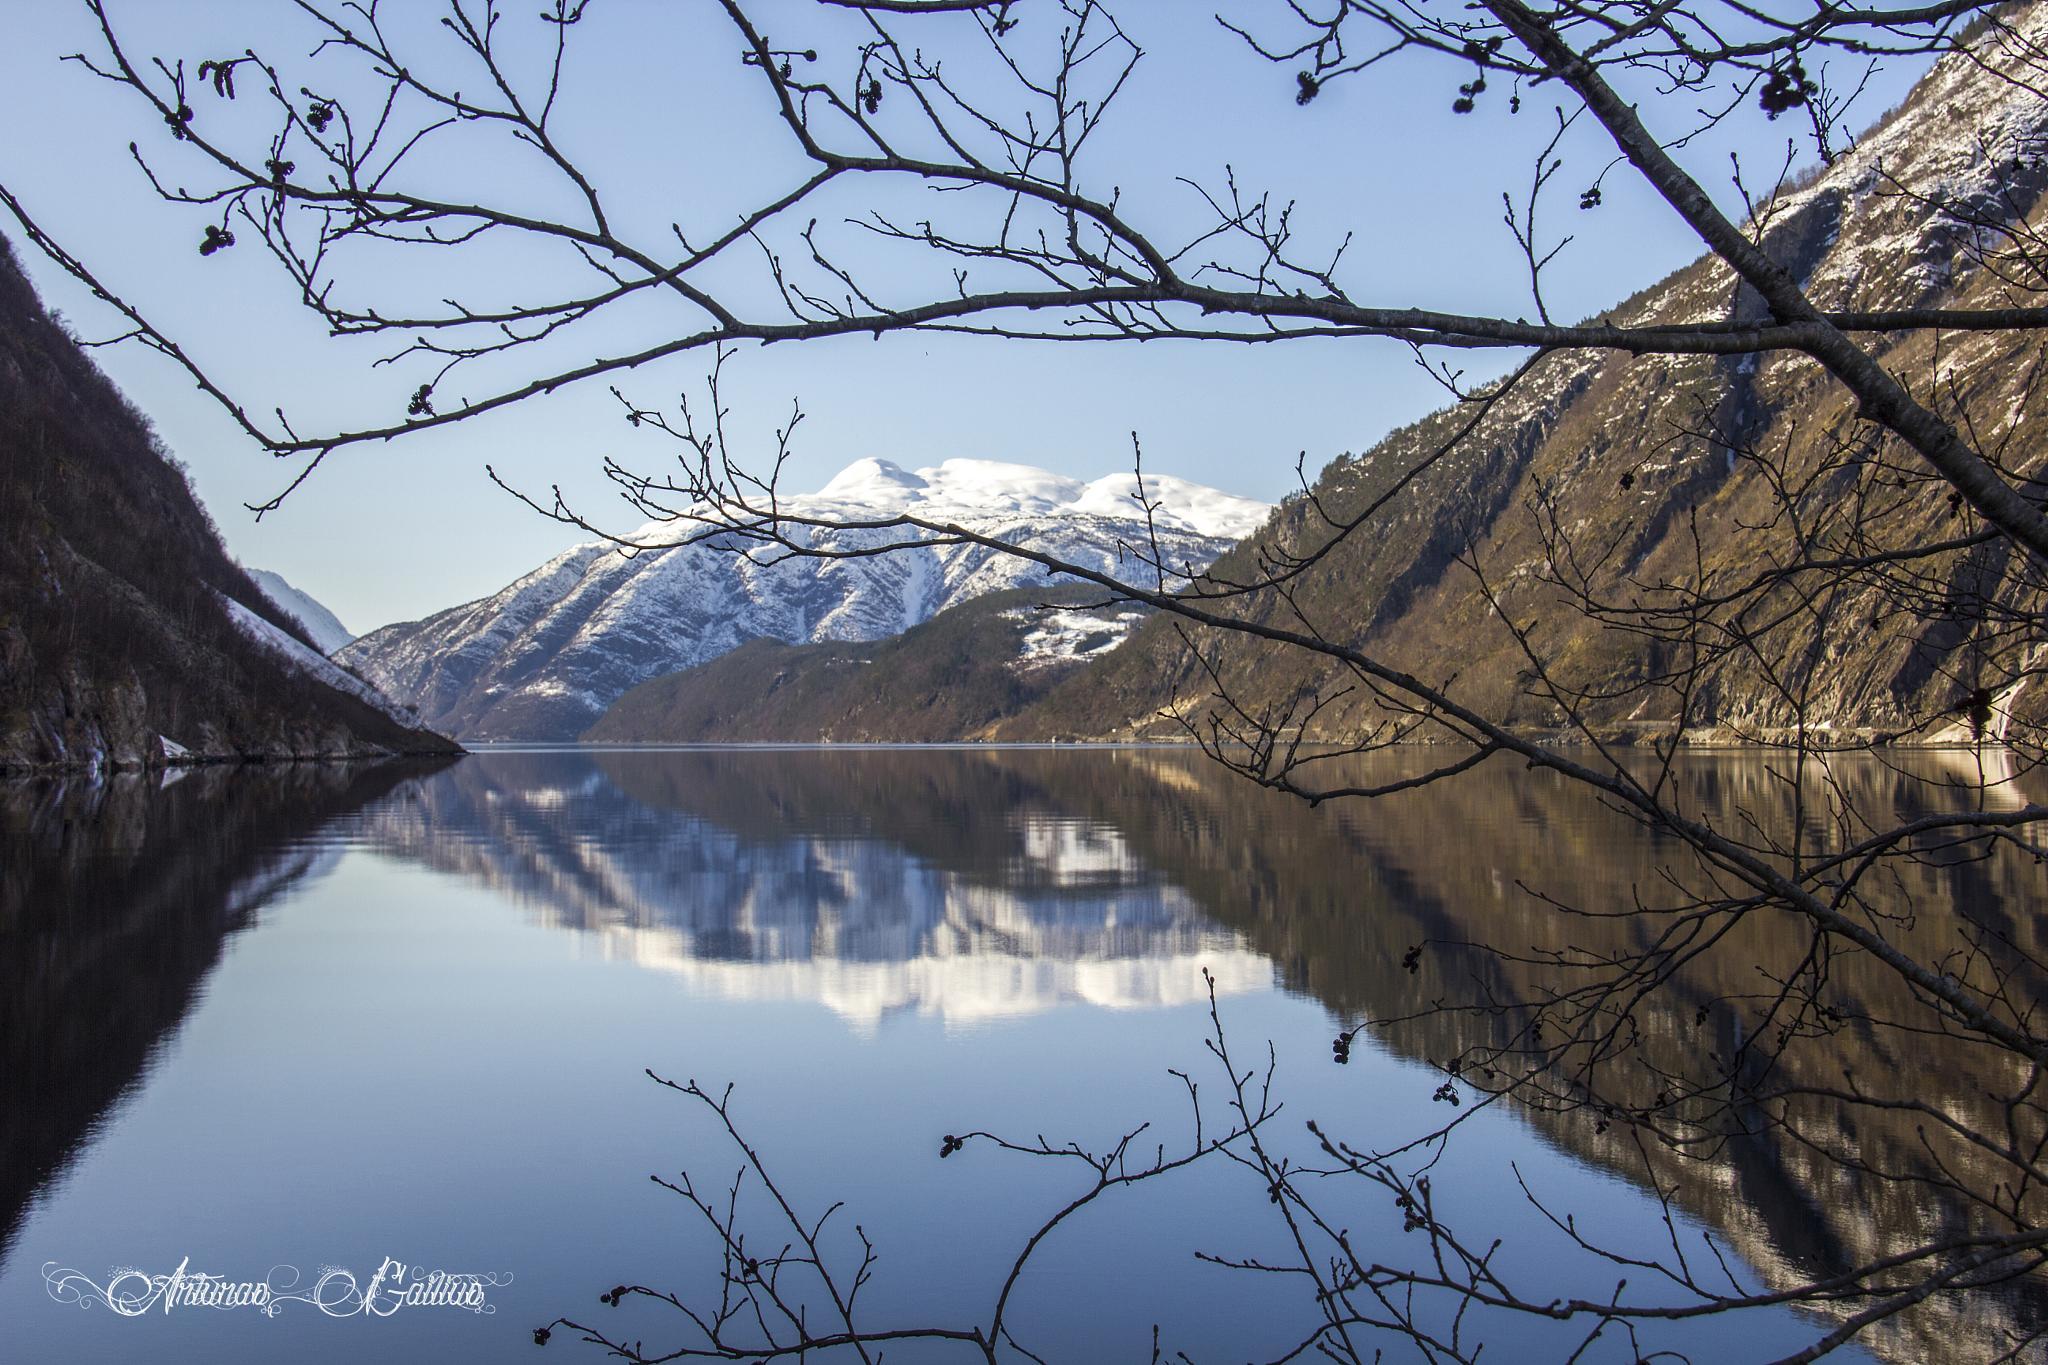 Reflection by Arturas Gailius